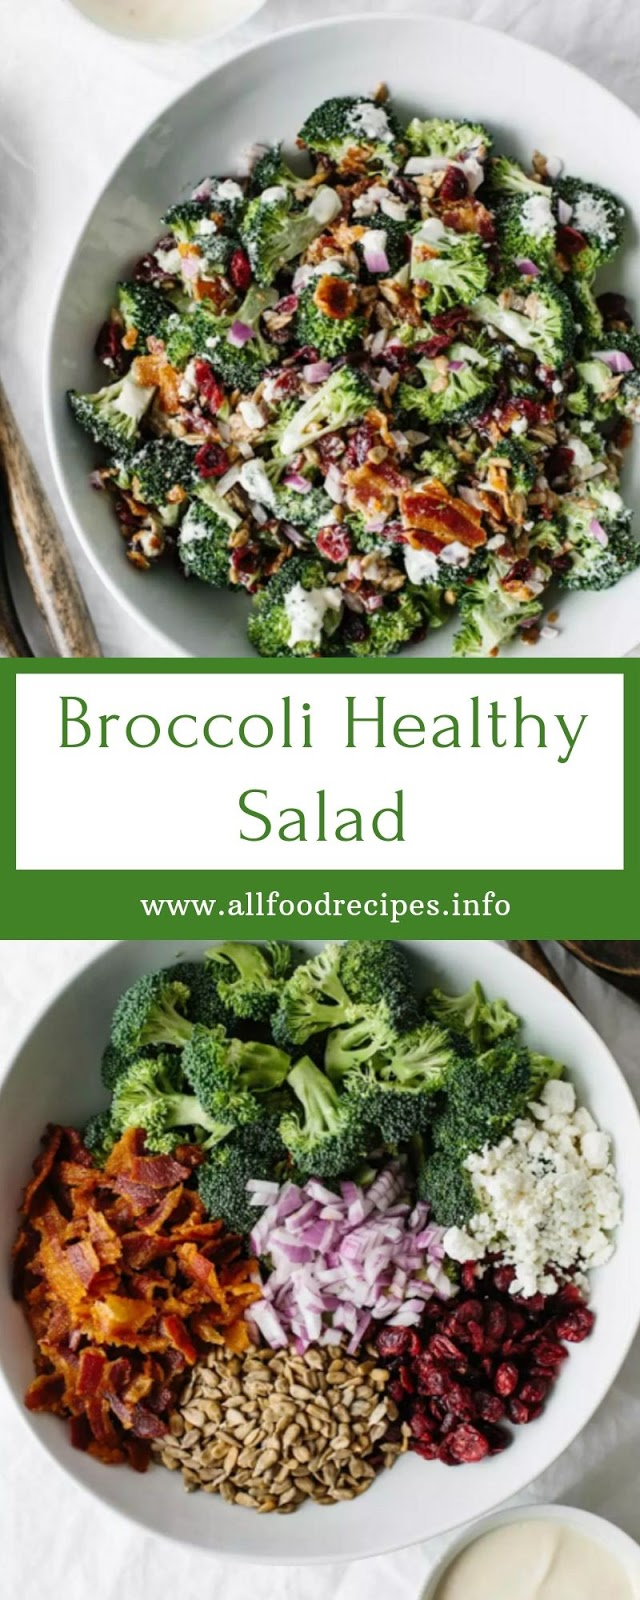 Broccoli Healthy Salad